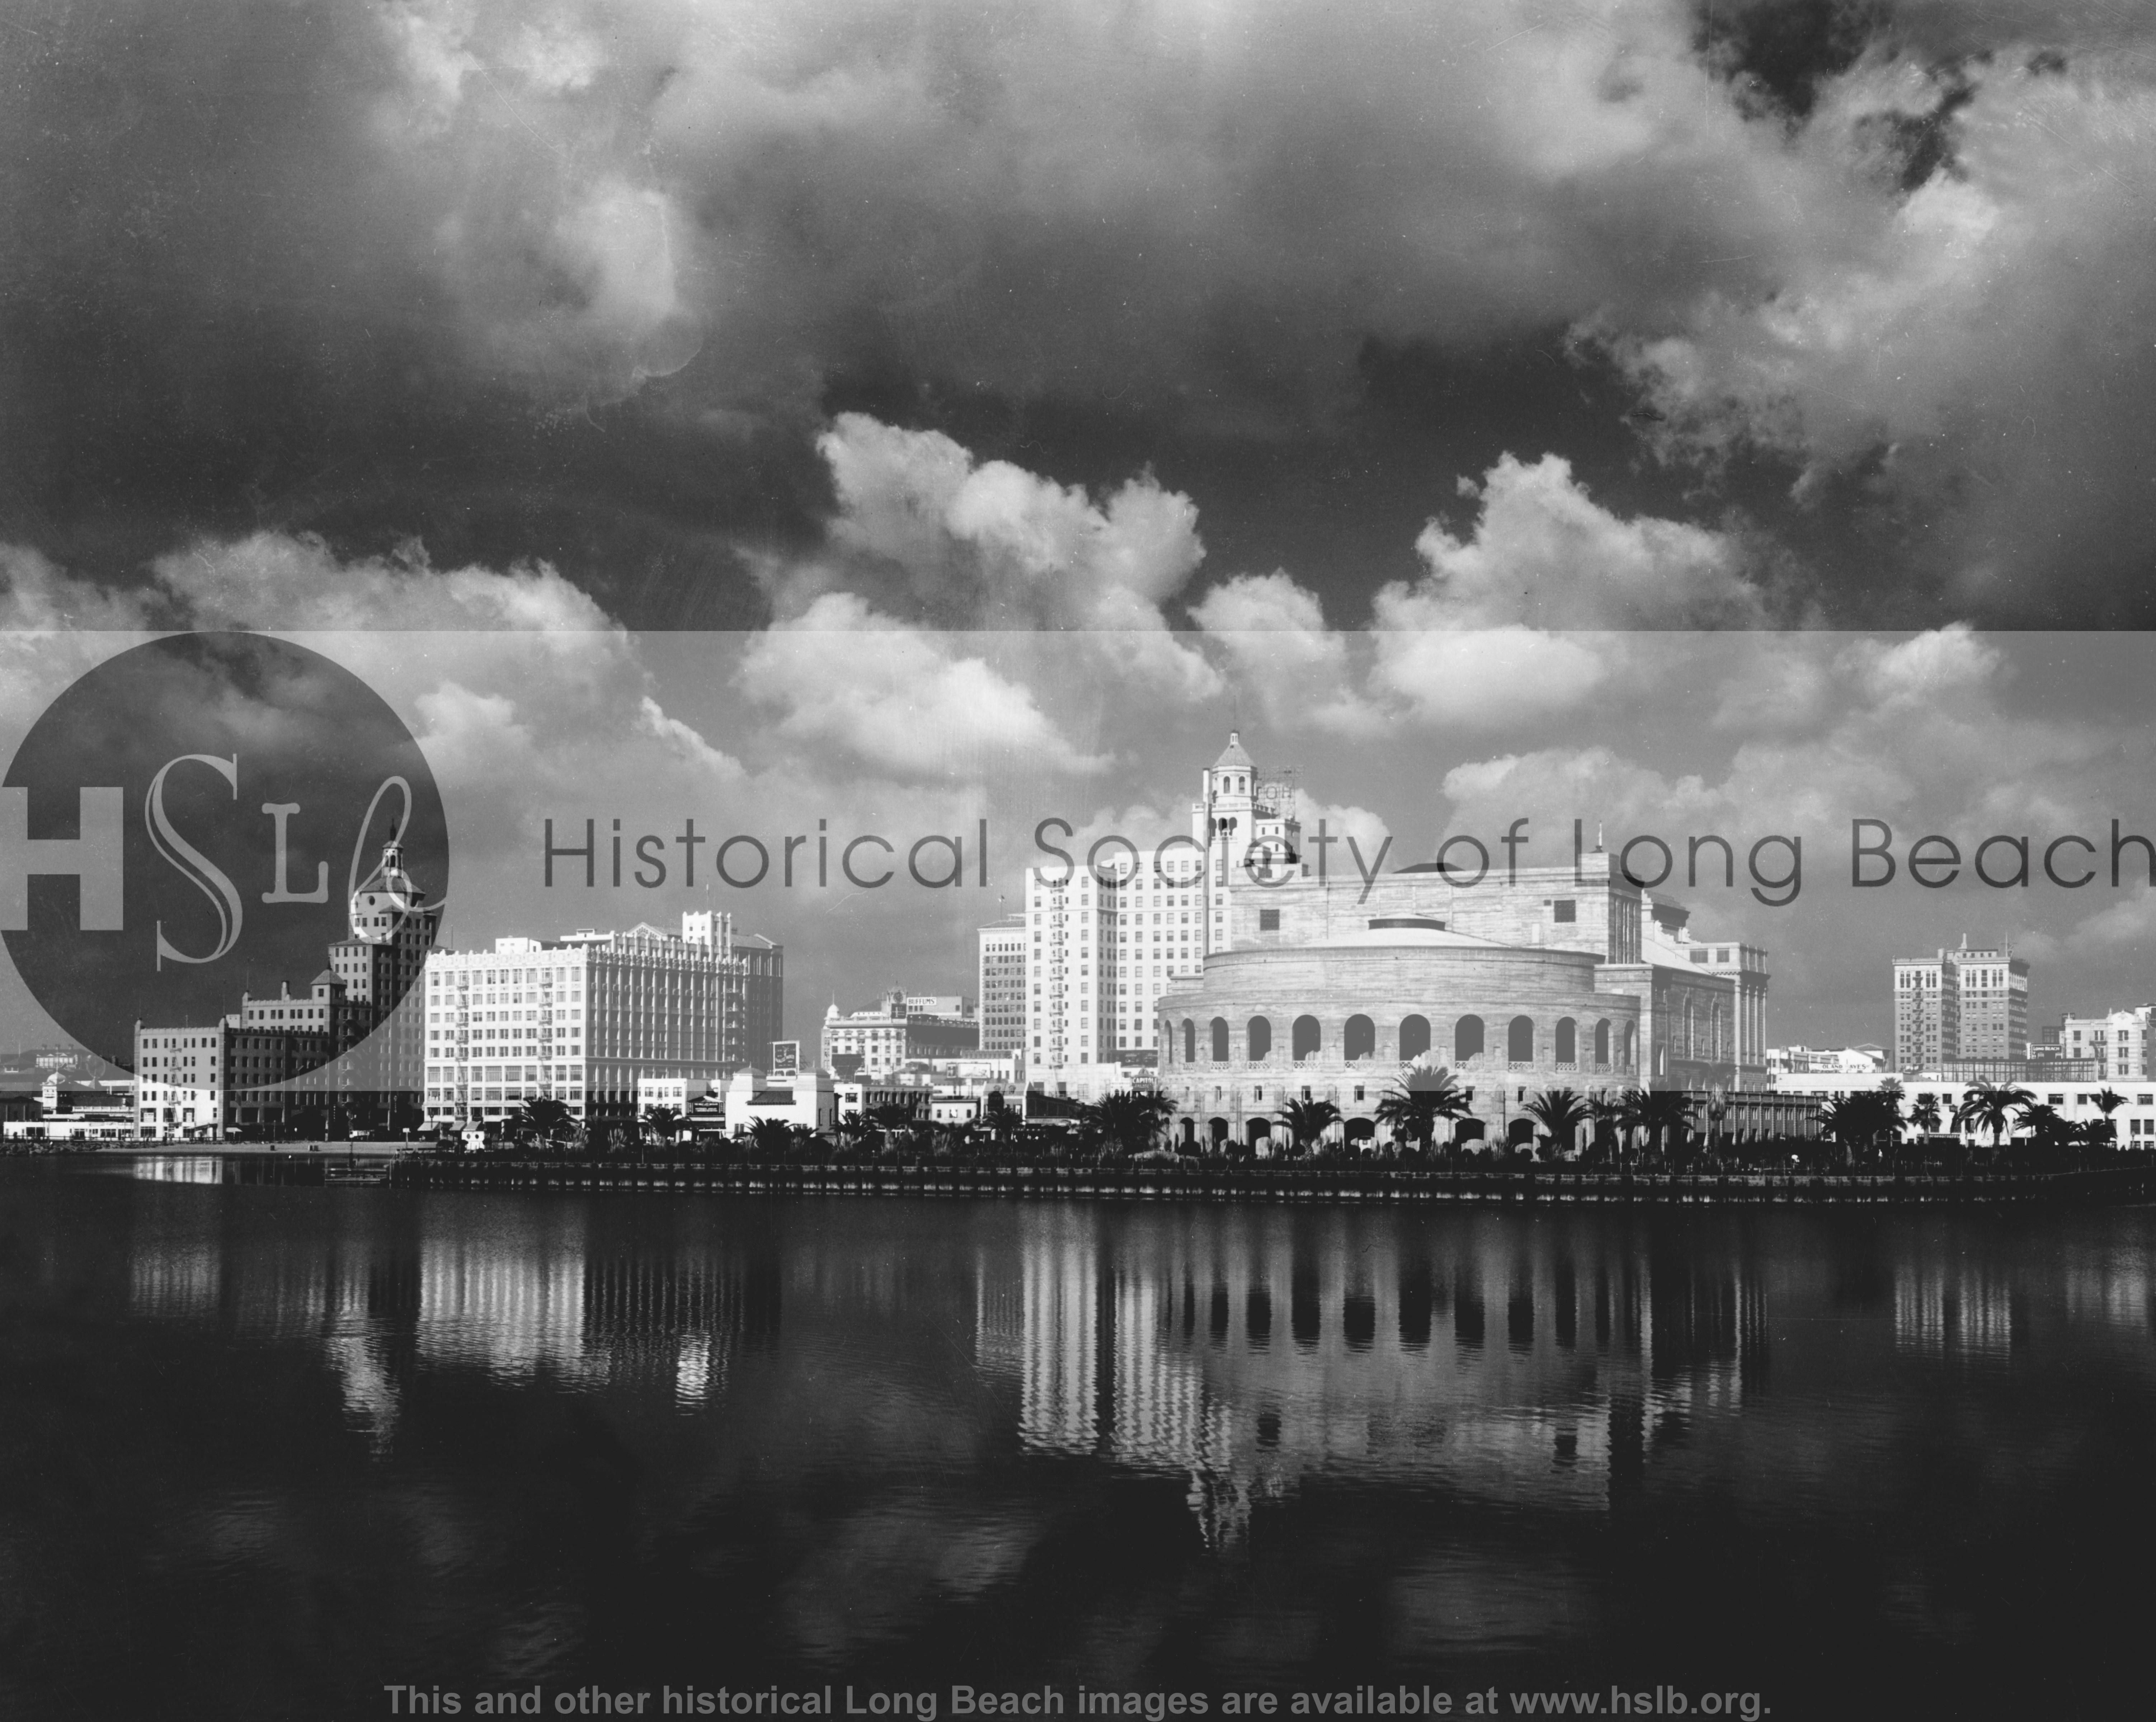 Skyline with Auditorium, 1933 historical photograph